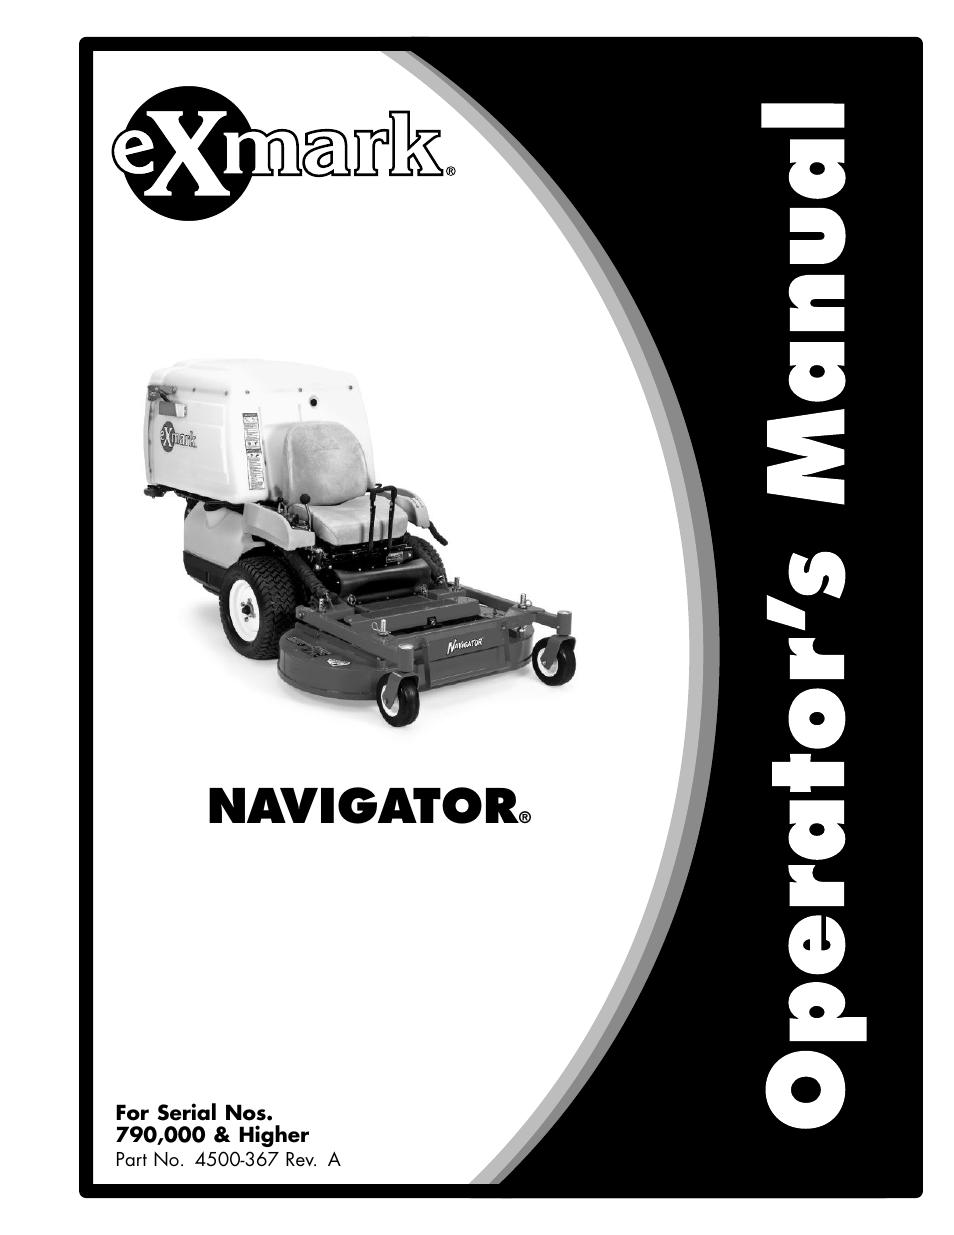 exmark navigator 4500 367 user manual 44 pages rh manualsdir com Exmark Navigator Mower Exmark Mowers